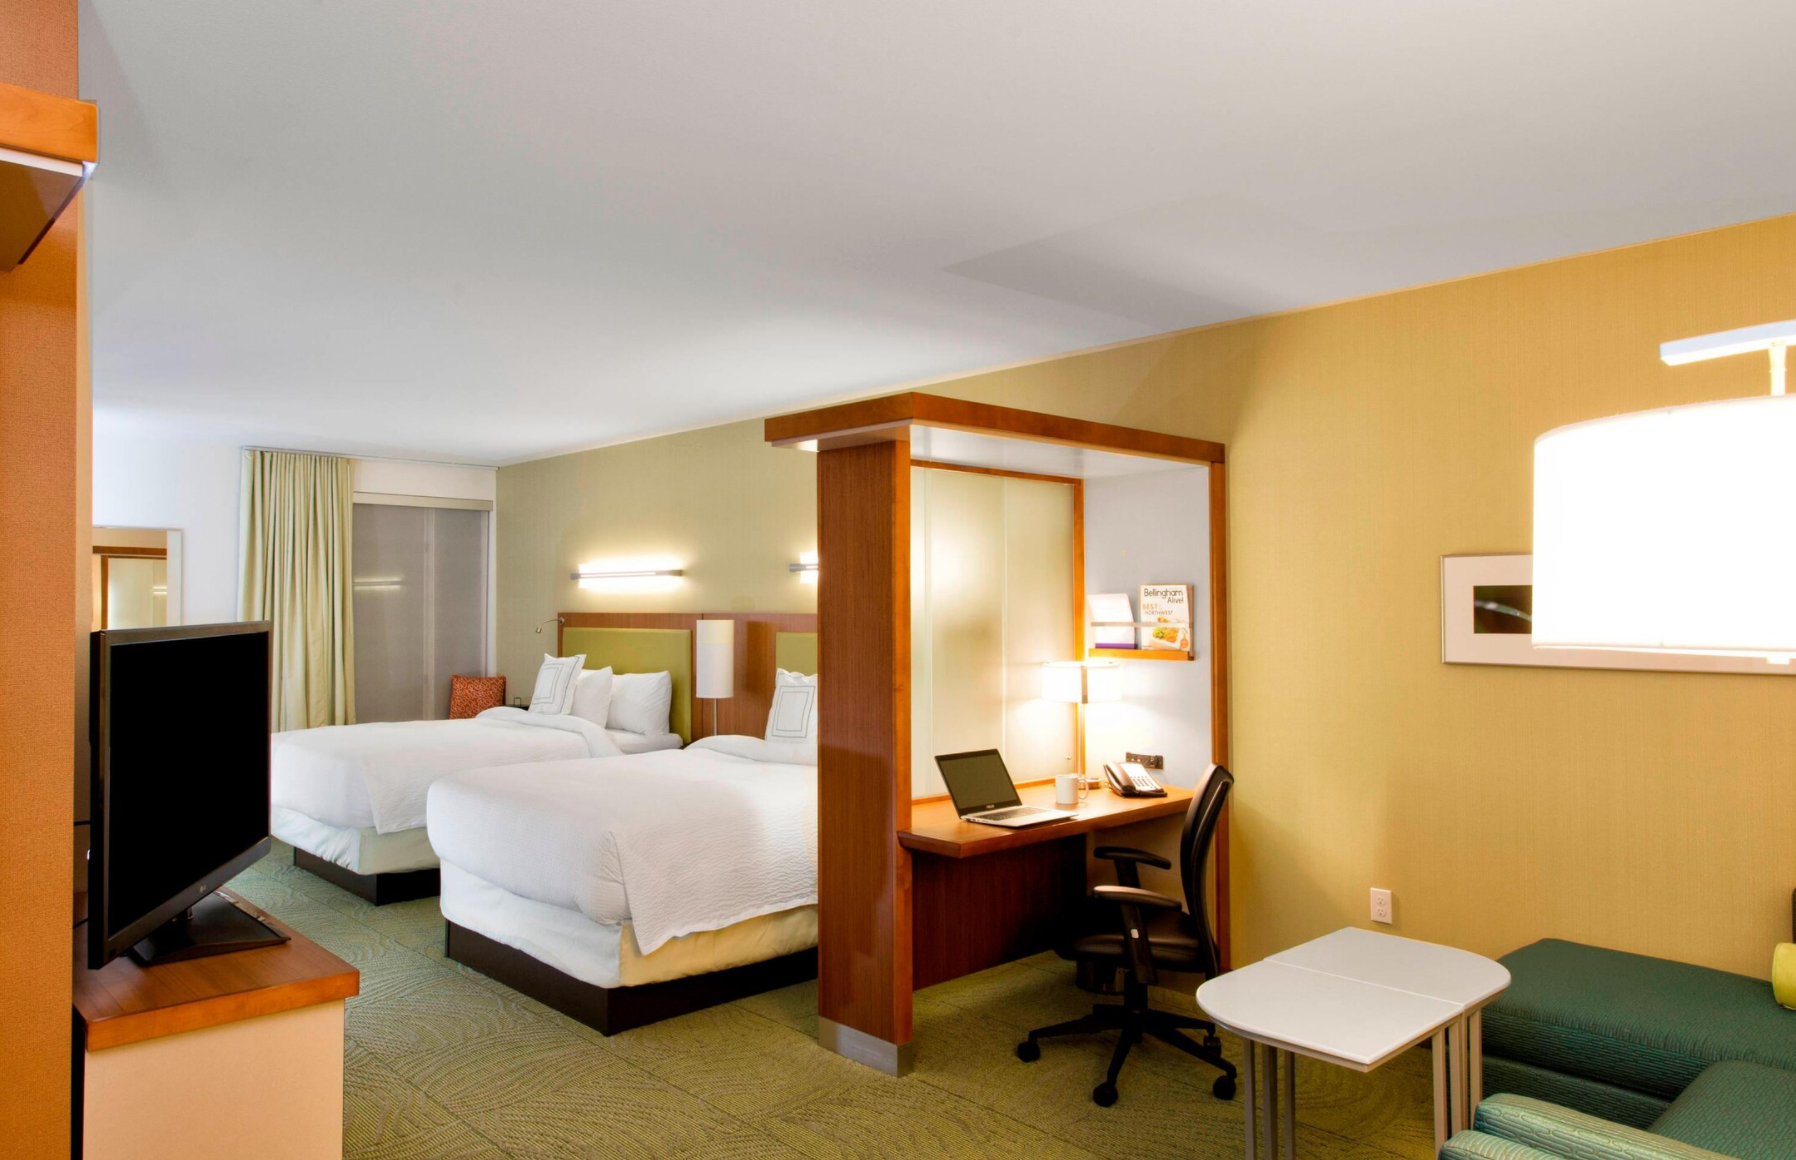 https://www.hotelsbyday.com/_data/default-hotel_image/4/22002/screenshot-2020-09-20-at-9-21-35-pm.png